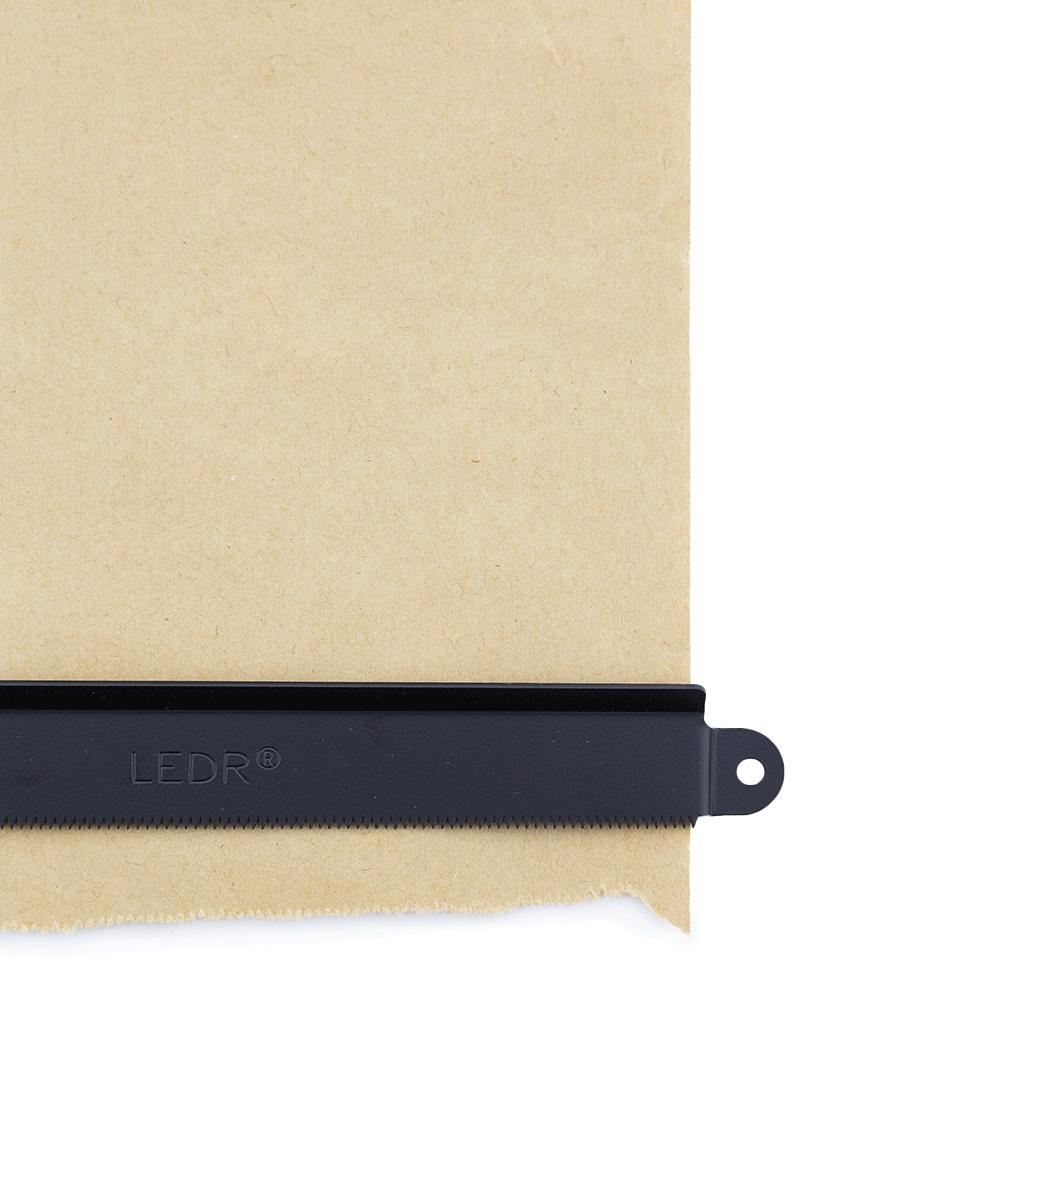 Kraftpapier Roller XL - Schwarz-4